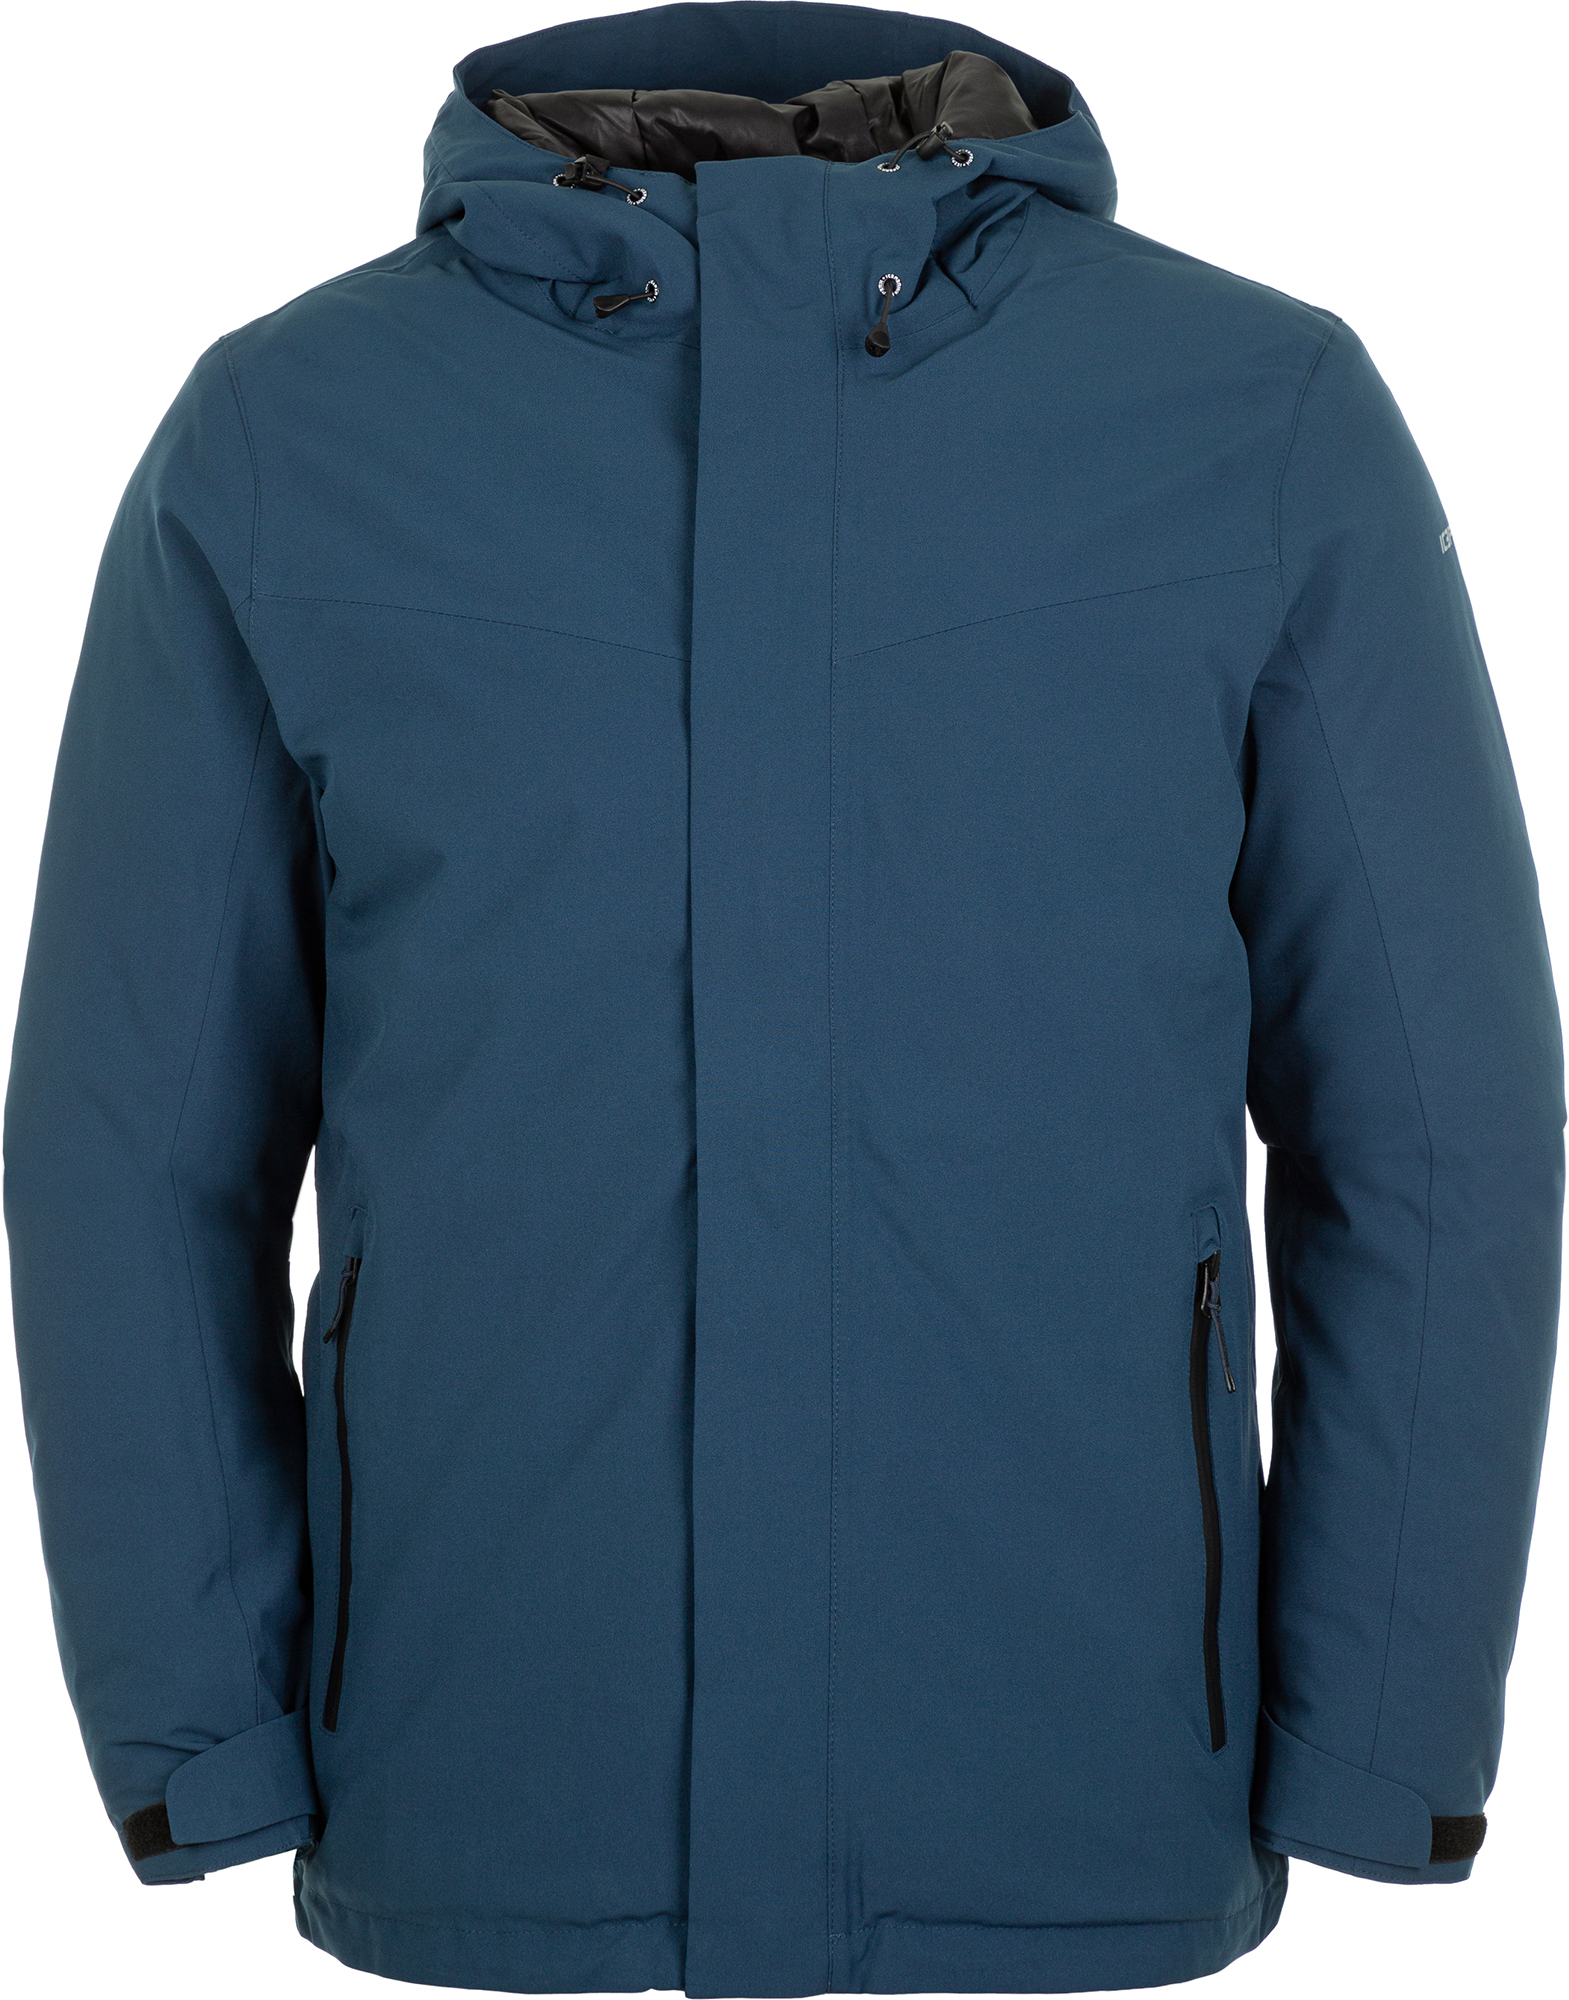 IcePeak Куртка утепленная мужская IcePeak Pinesdale, размер 50